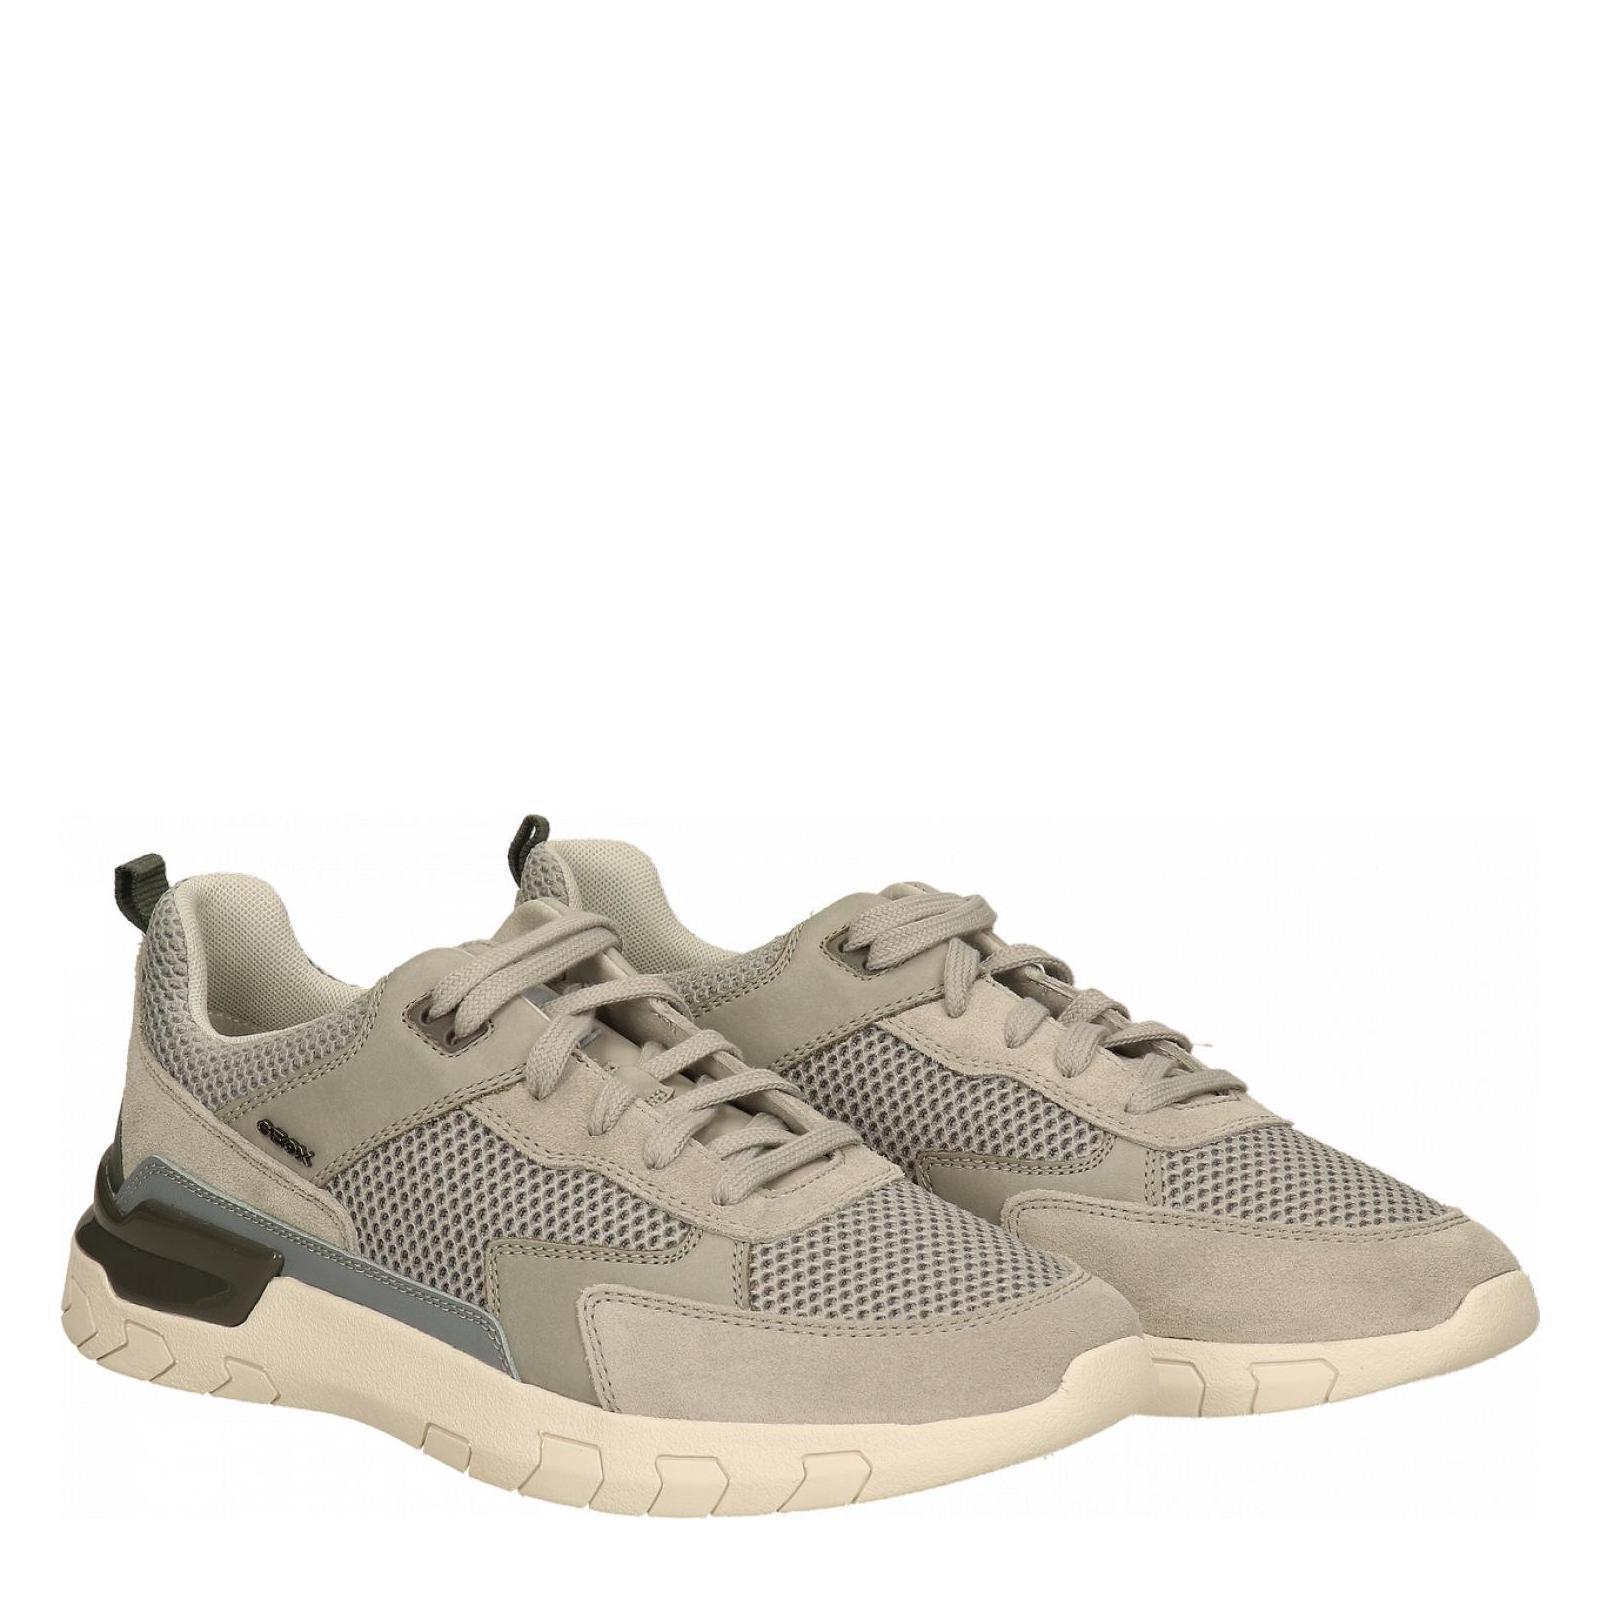 c1010-lt-grey